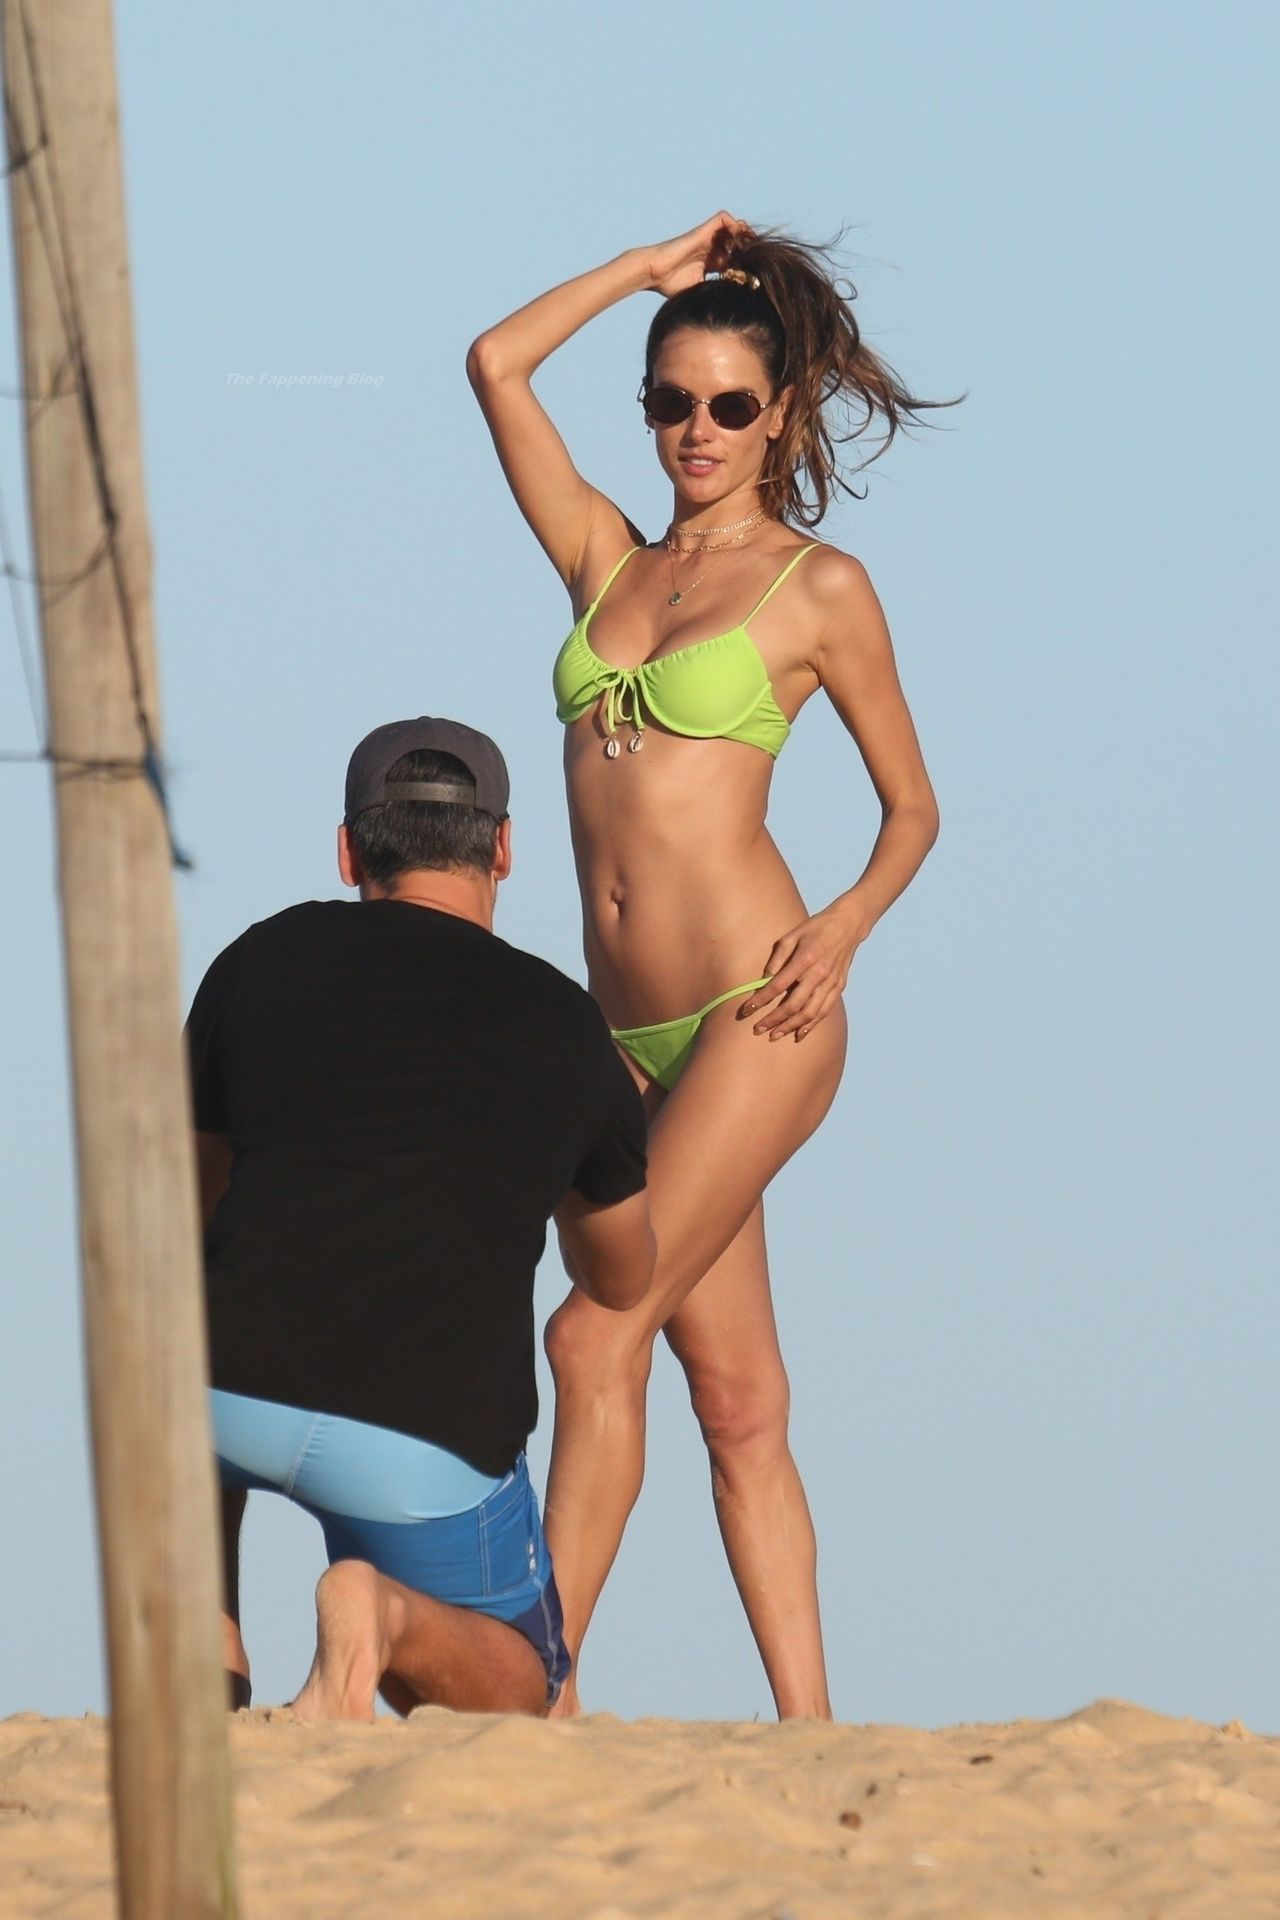 Alessandra-Ambrosio-Sexy-The-Fappening-Blog-531.jpg